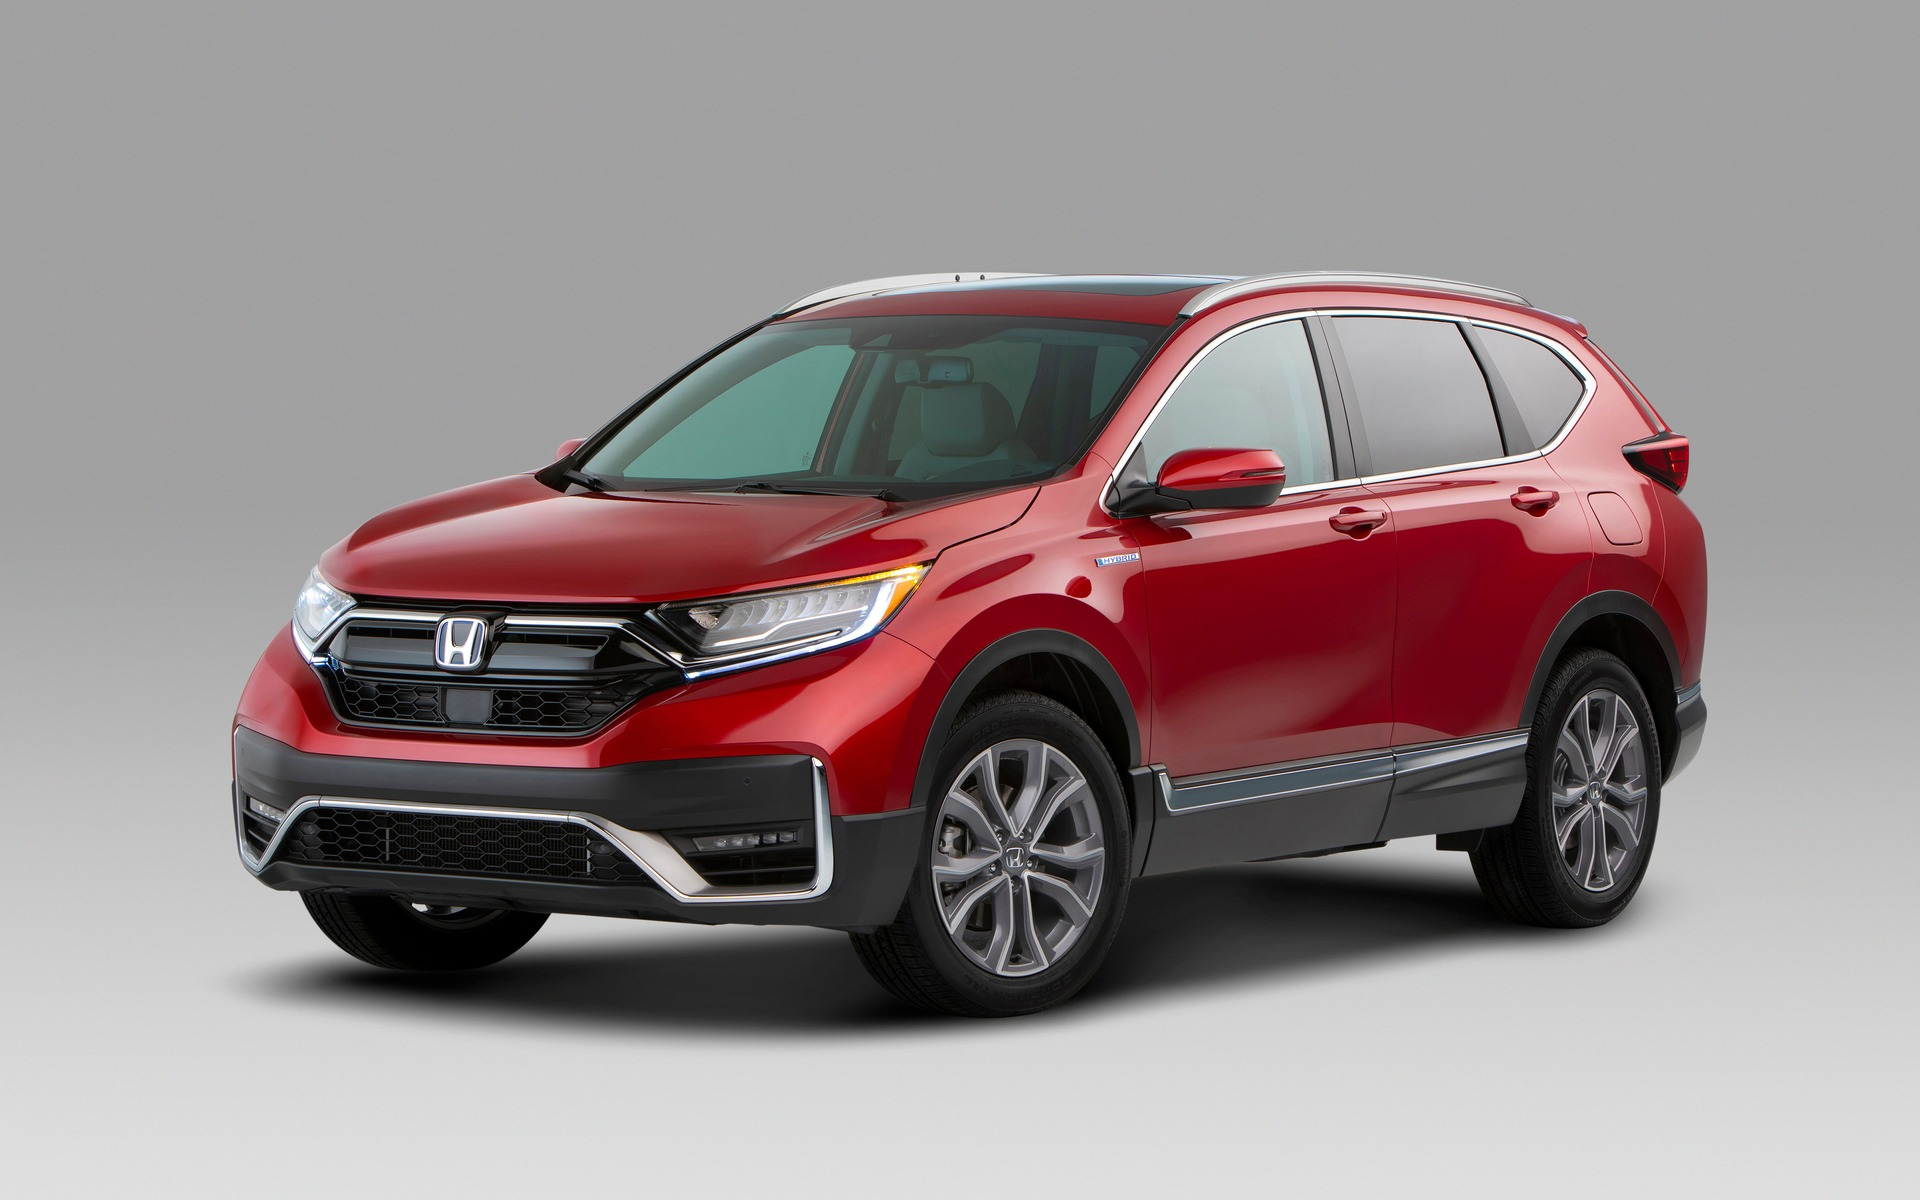 2017 Honda Crv Release Date >> 2020 Honda Cr V Gets Hybrid Treatment Canada Won T See It